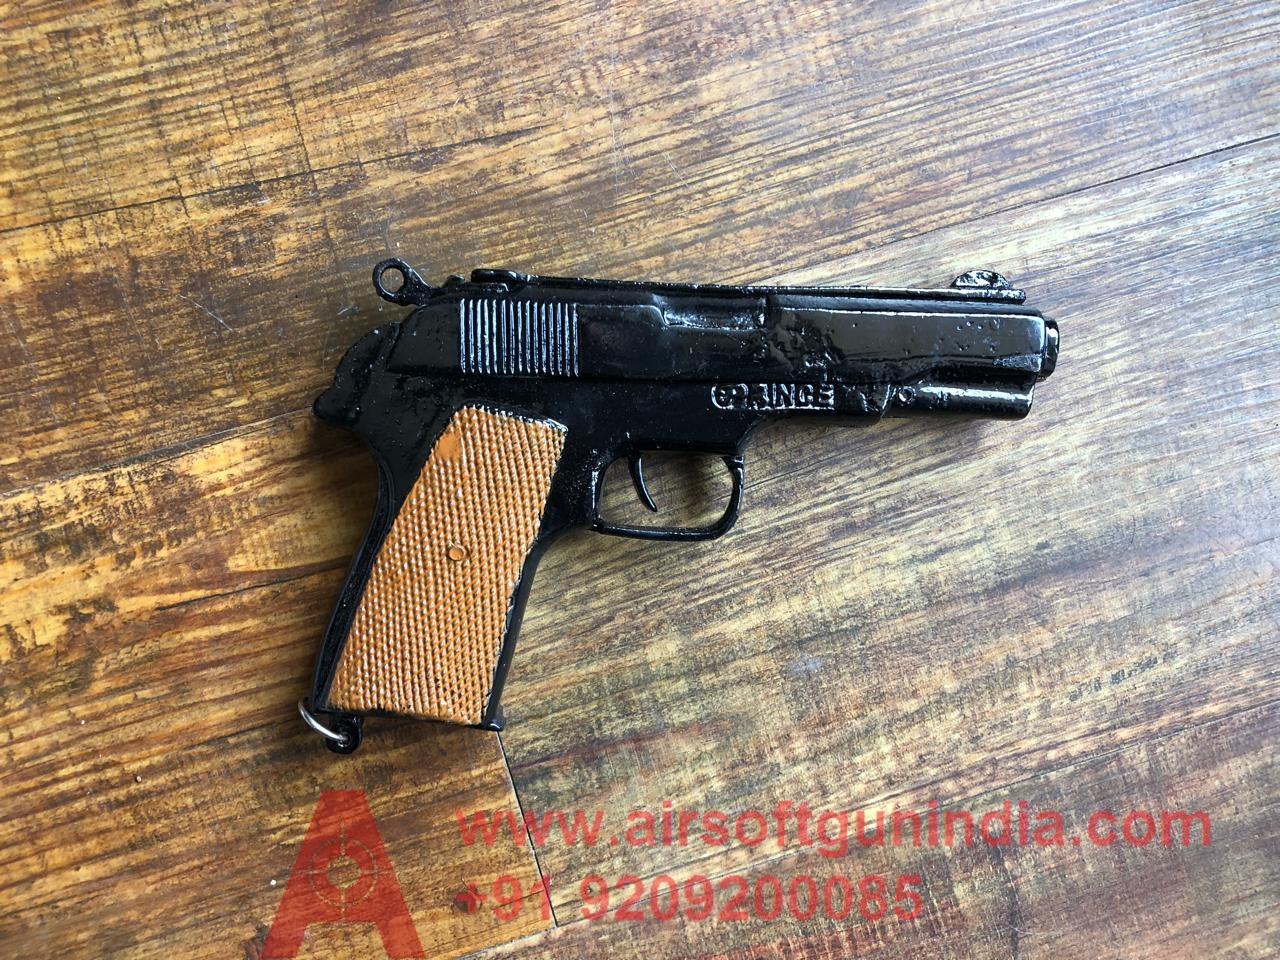 CORK GUN BERETTA STYLE BROWN  BY AIRSOFT GUN INDIA ( SOUND GUN ) FOR CROP PROTECTION